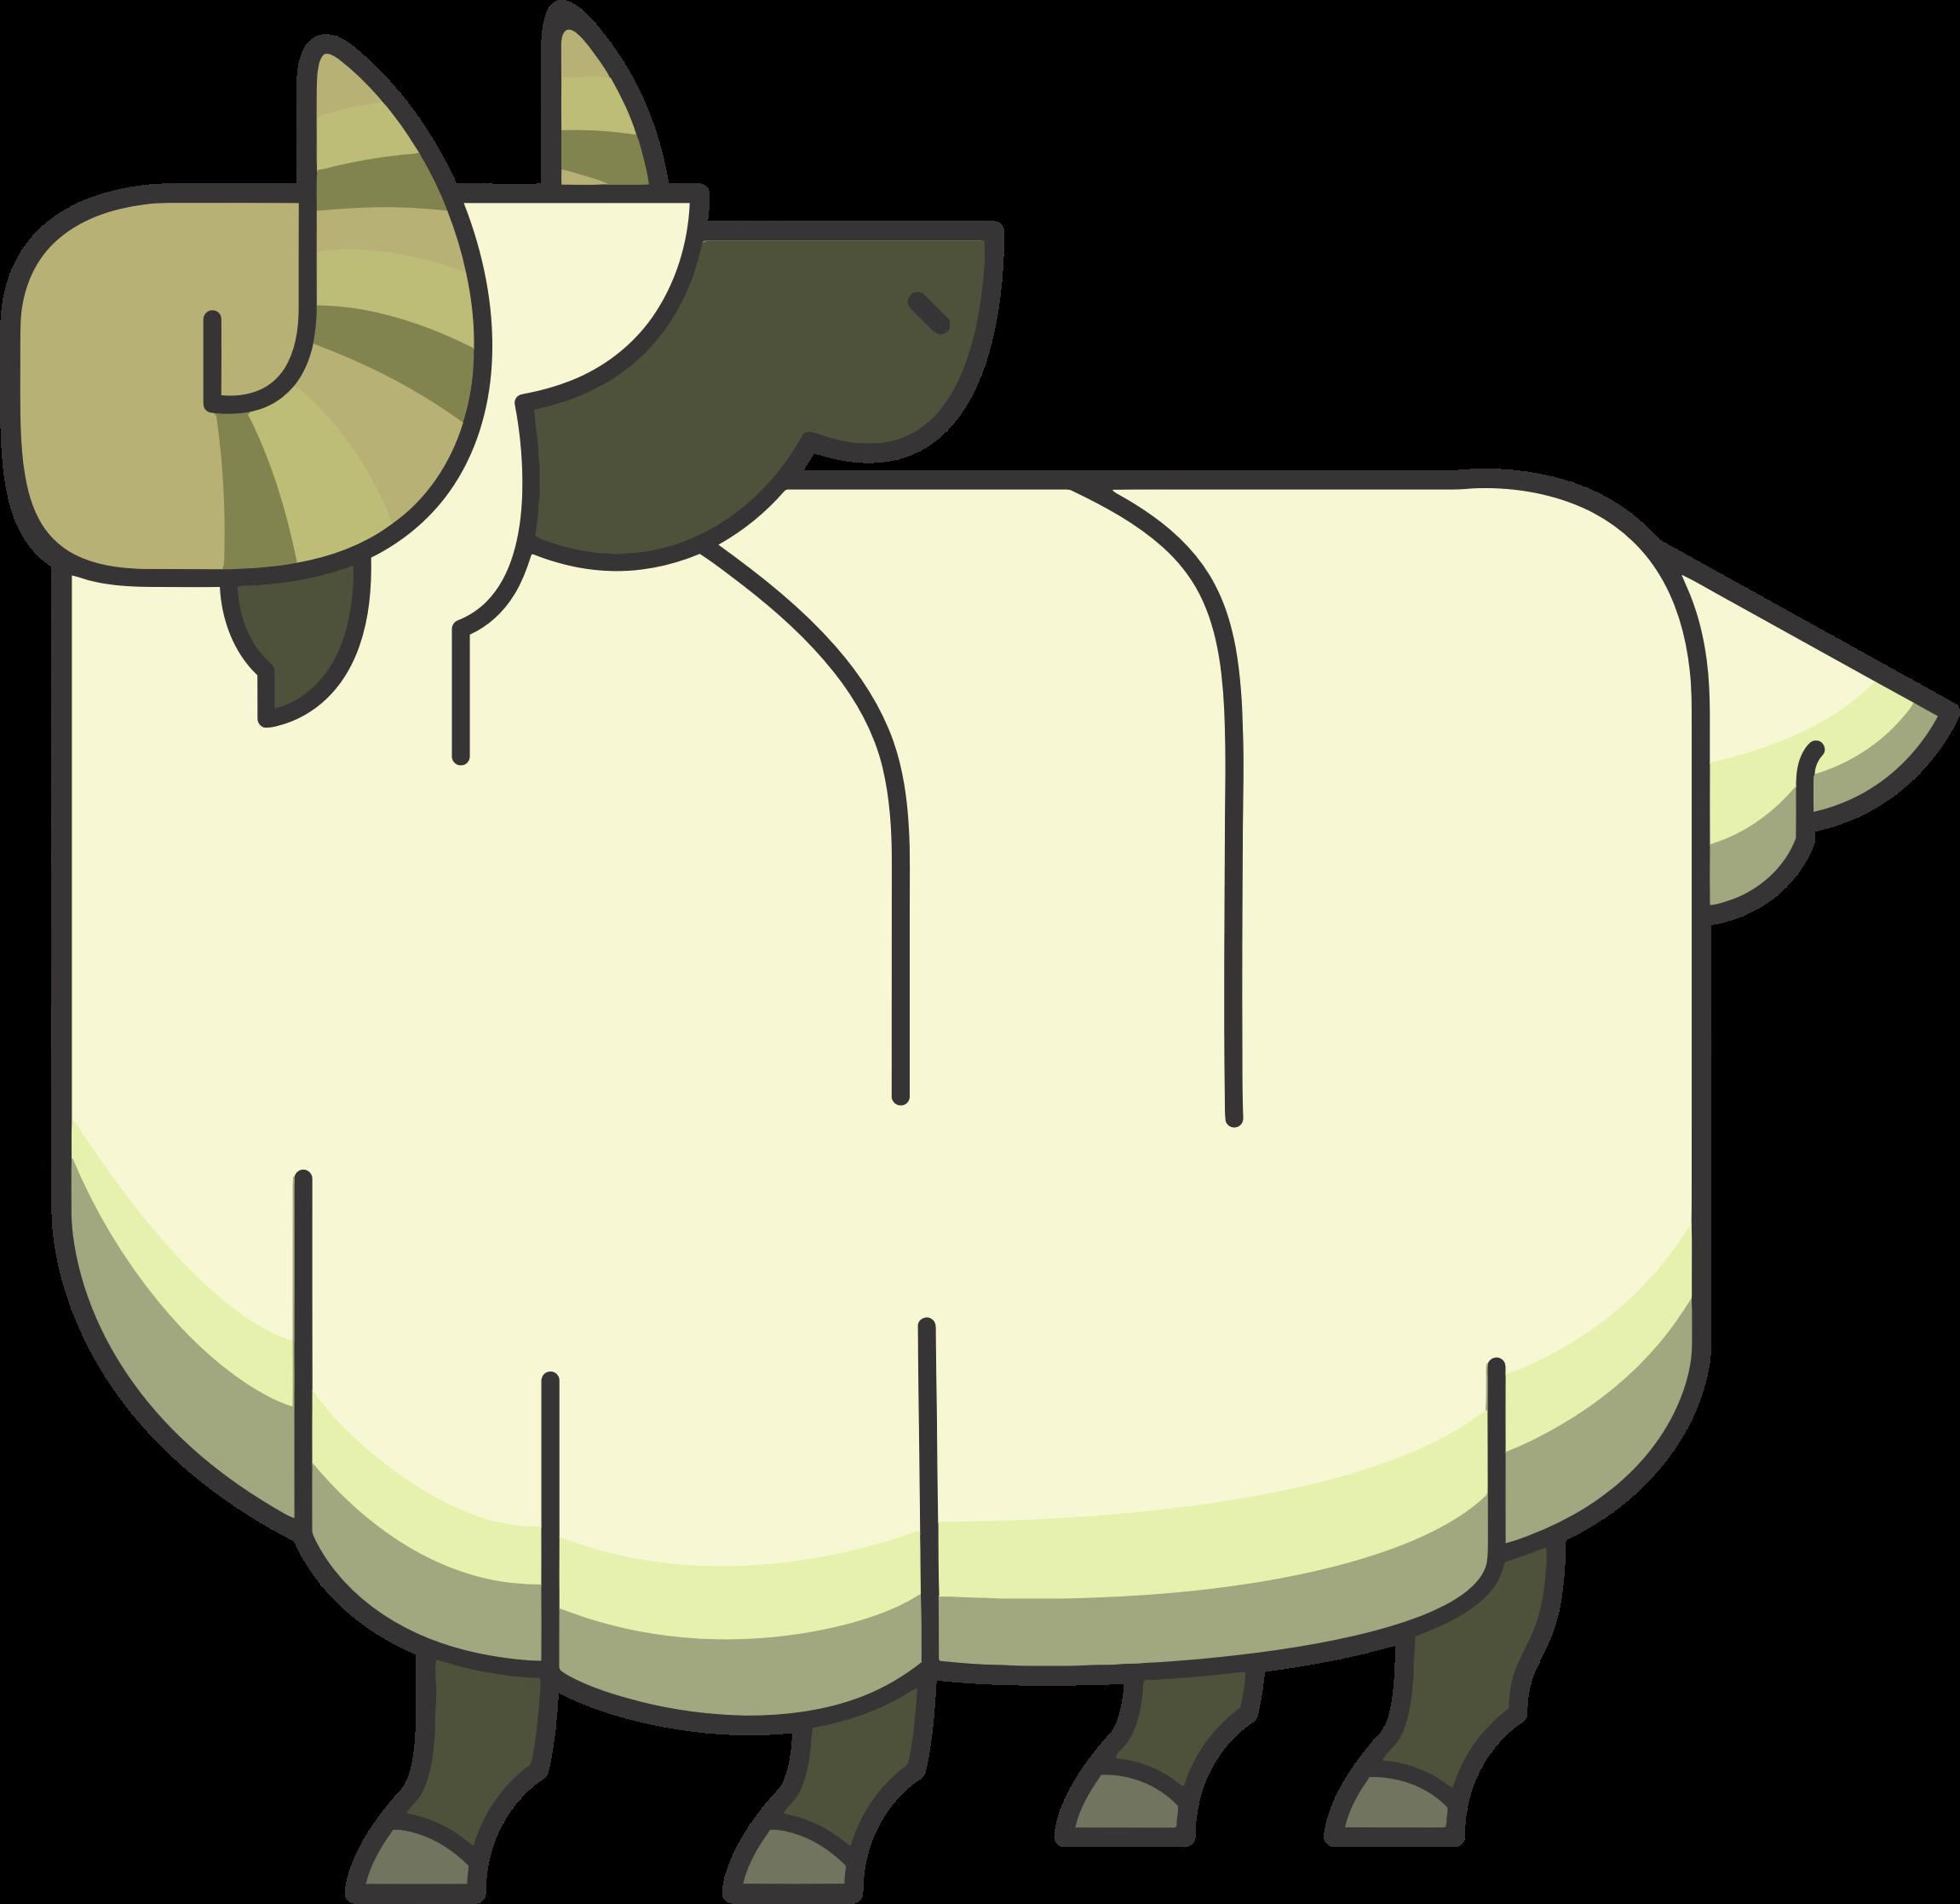 Lamb clipart ram. Stylized cartoon big image